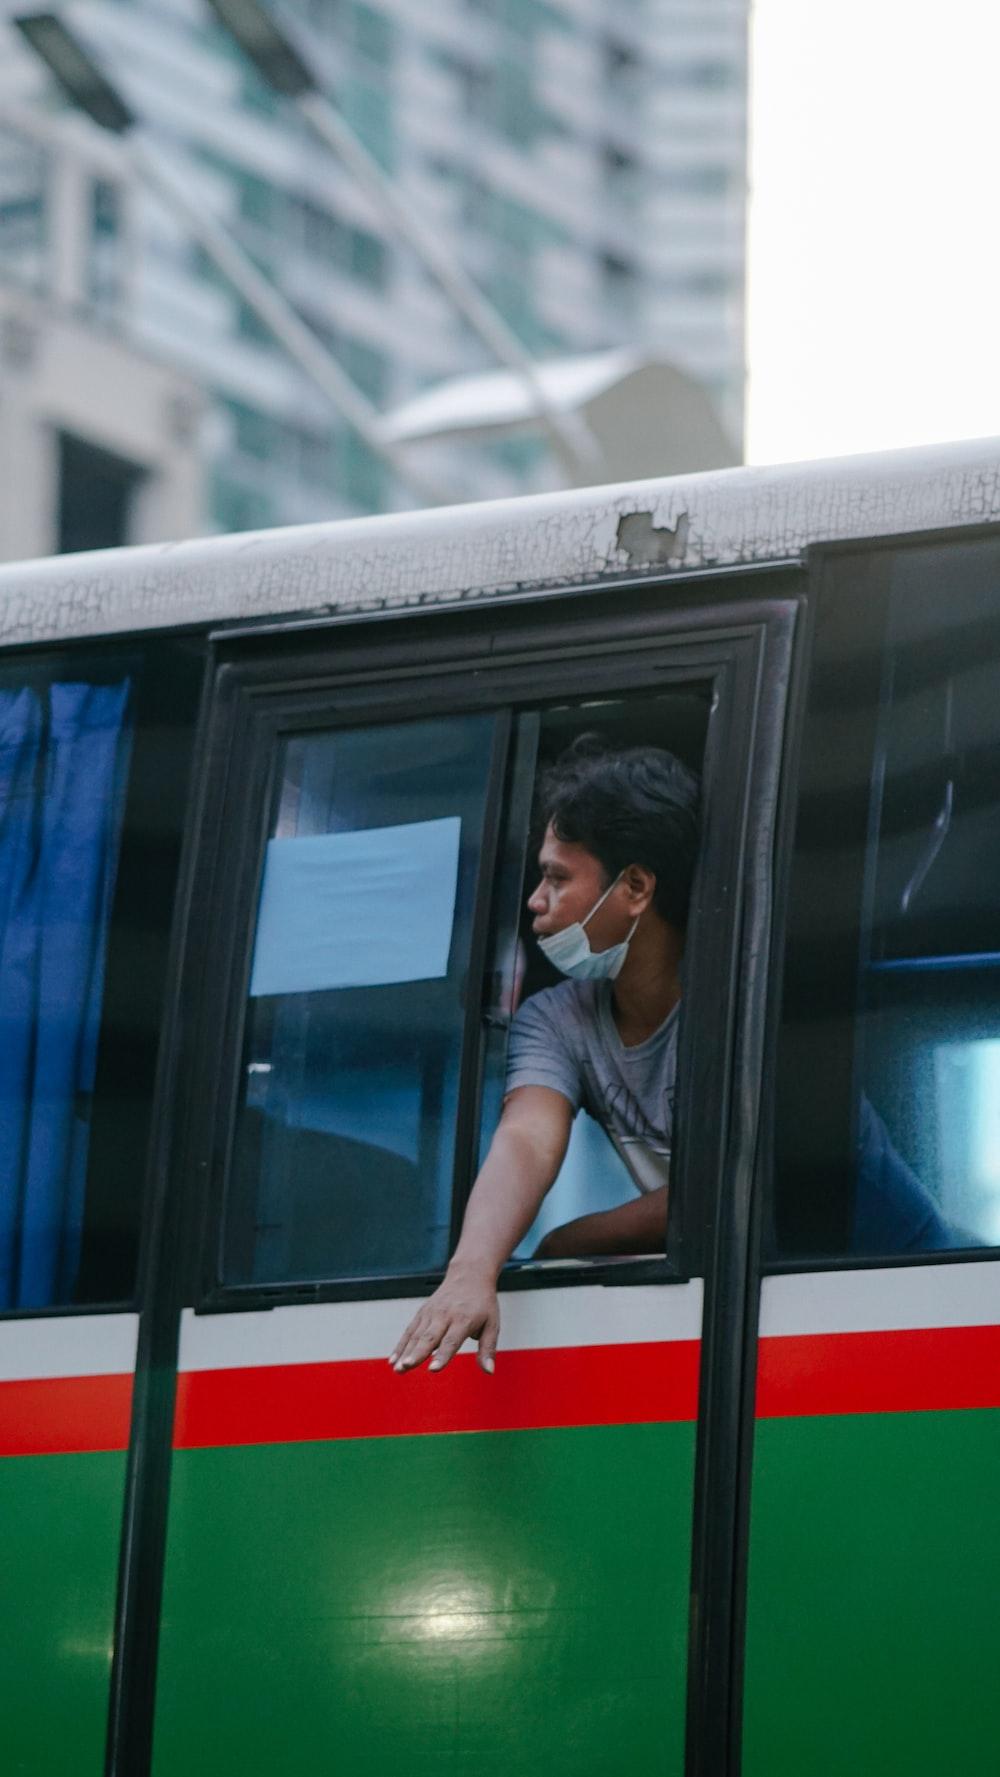 man in black t-shirt sitting on train window